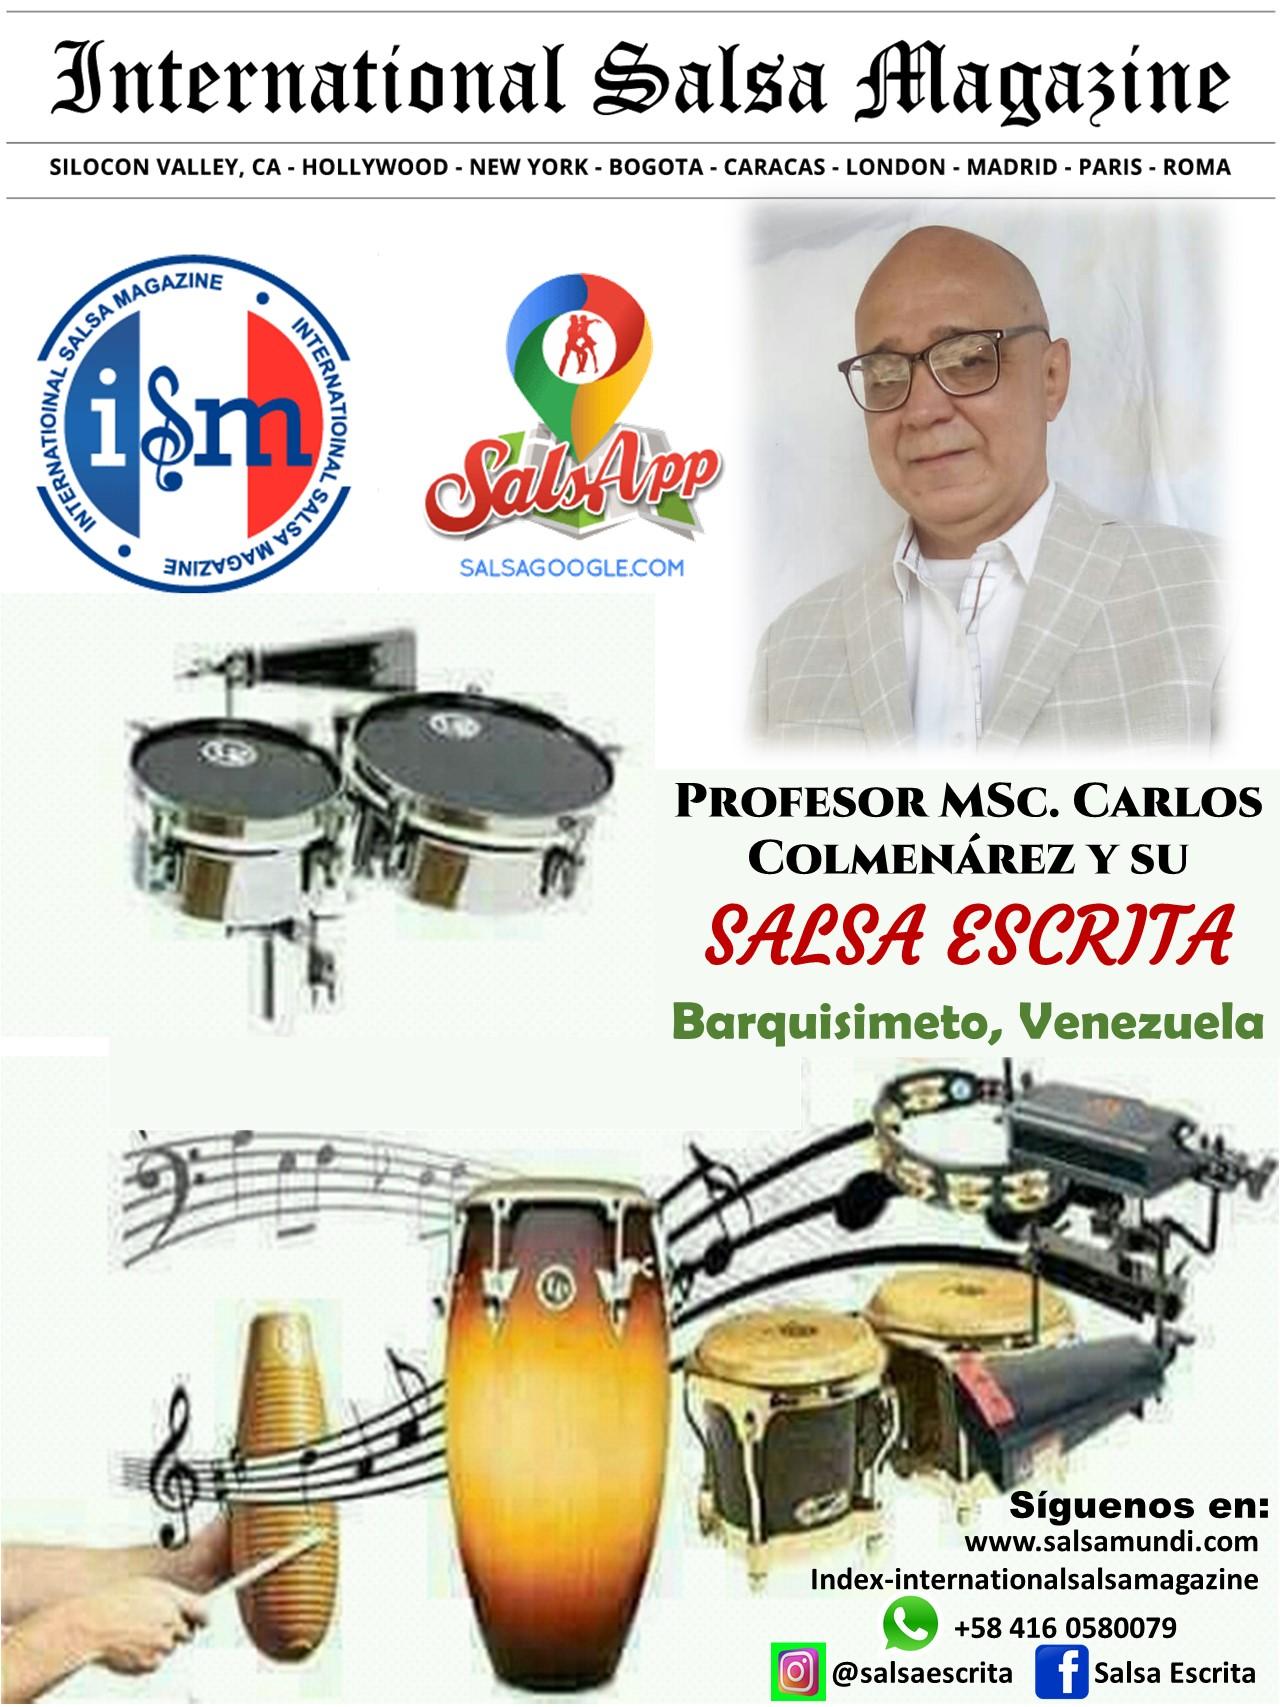 Salsa Escrita, in charge of this server, your friend of always, professor MSc. Carlos Colmenárez